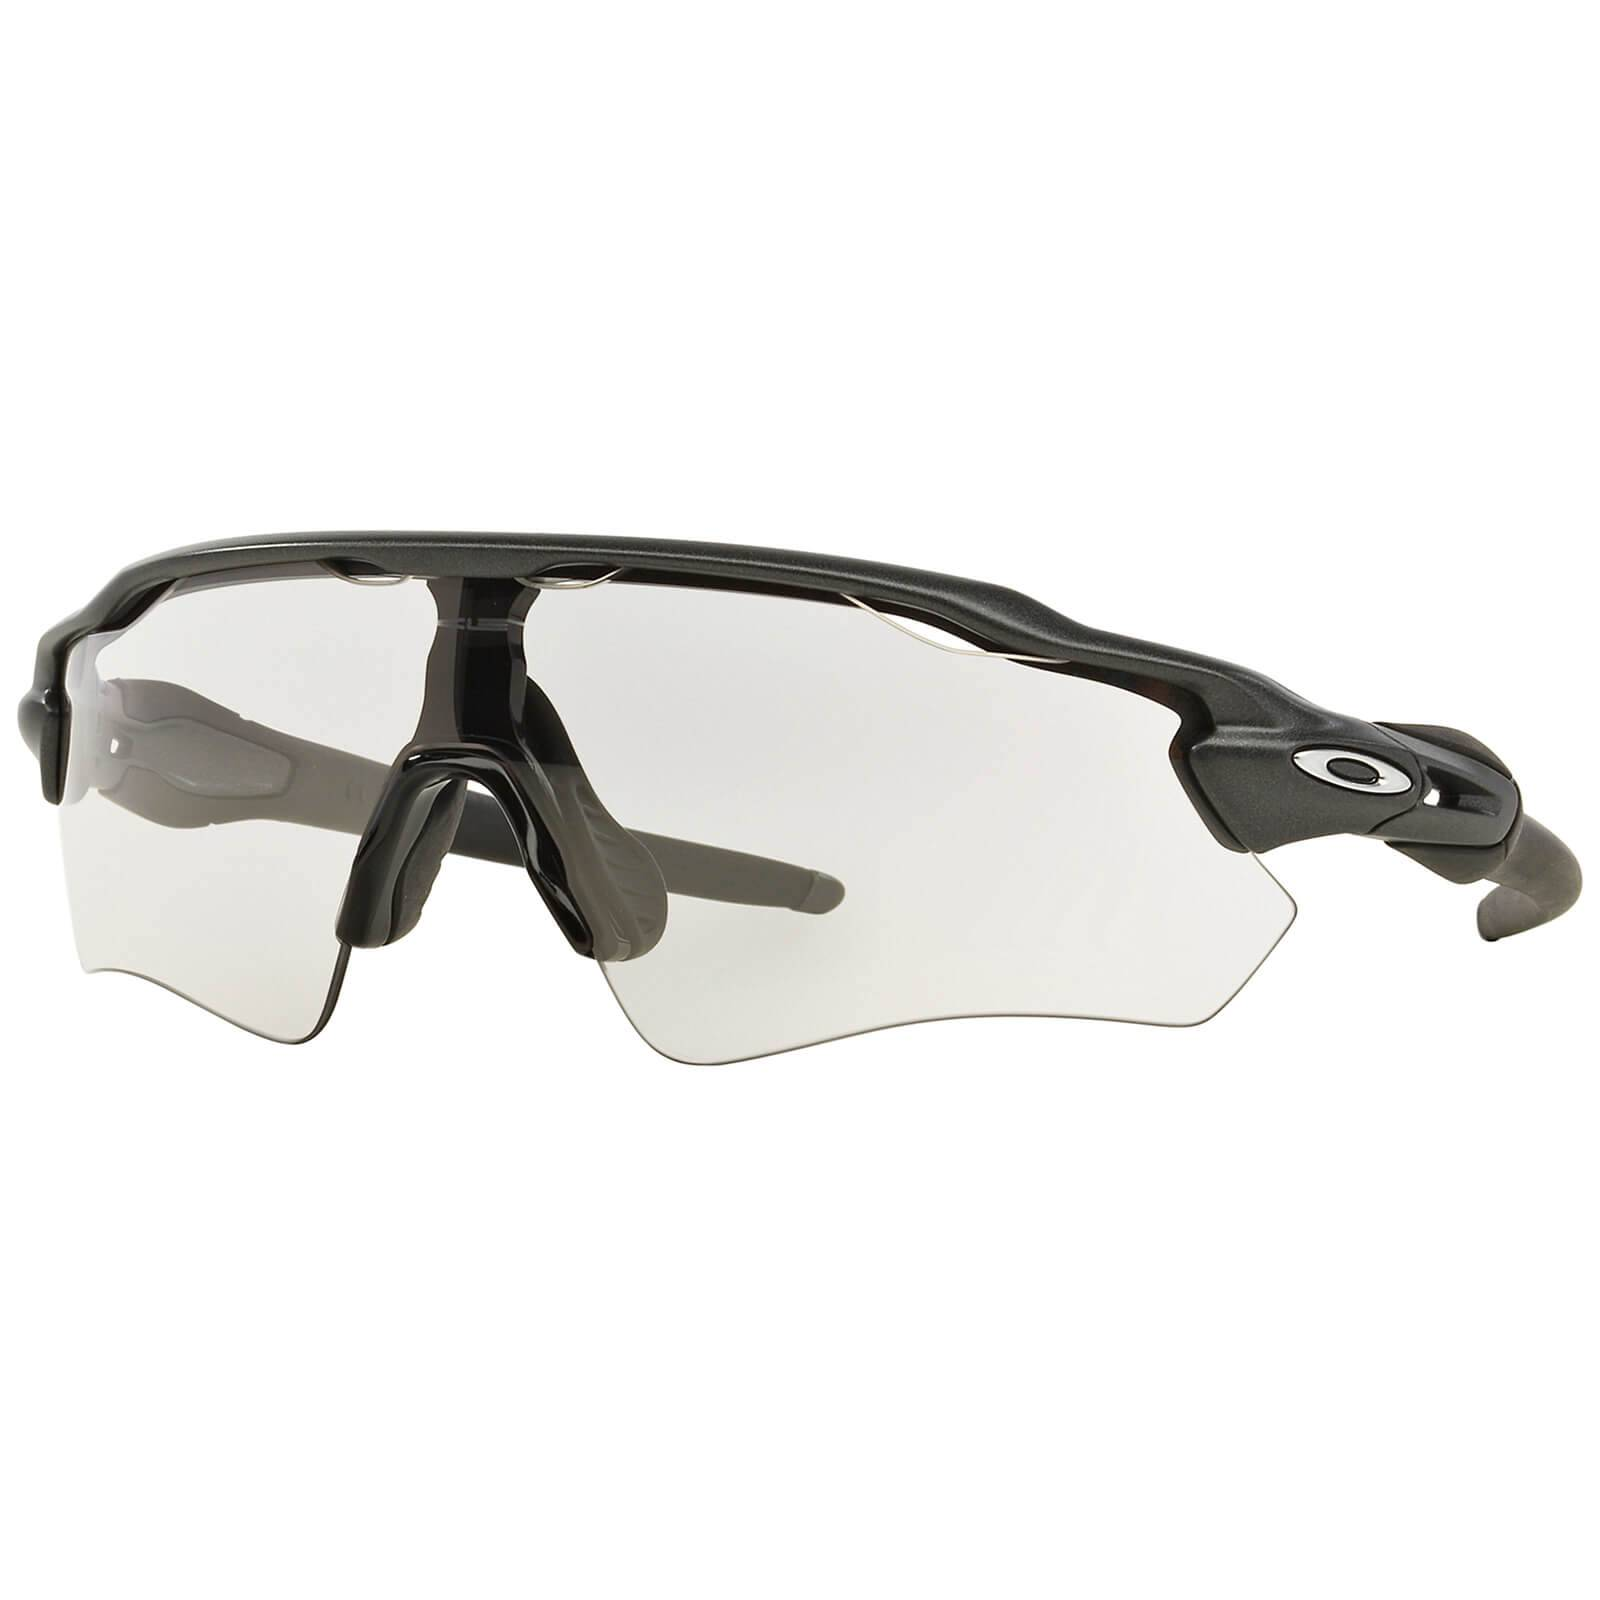 Oakley Radar EV Path Photochromic Road Sunglasses - Black Iridium